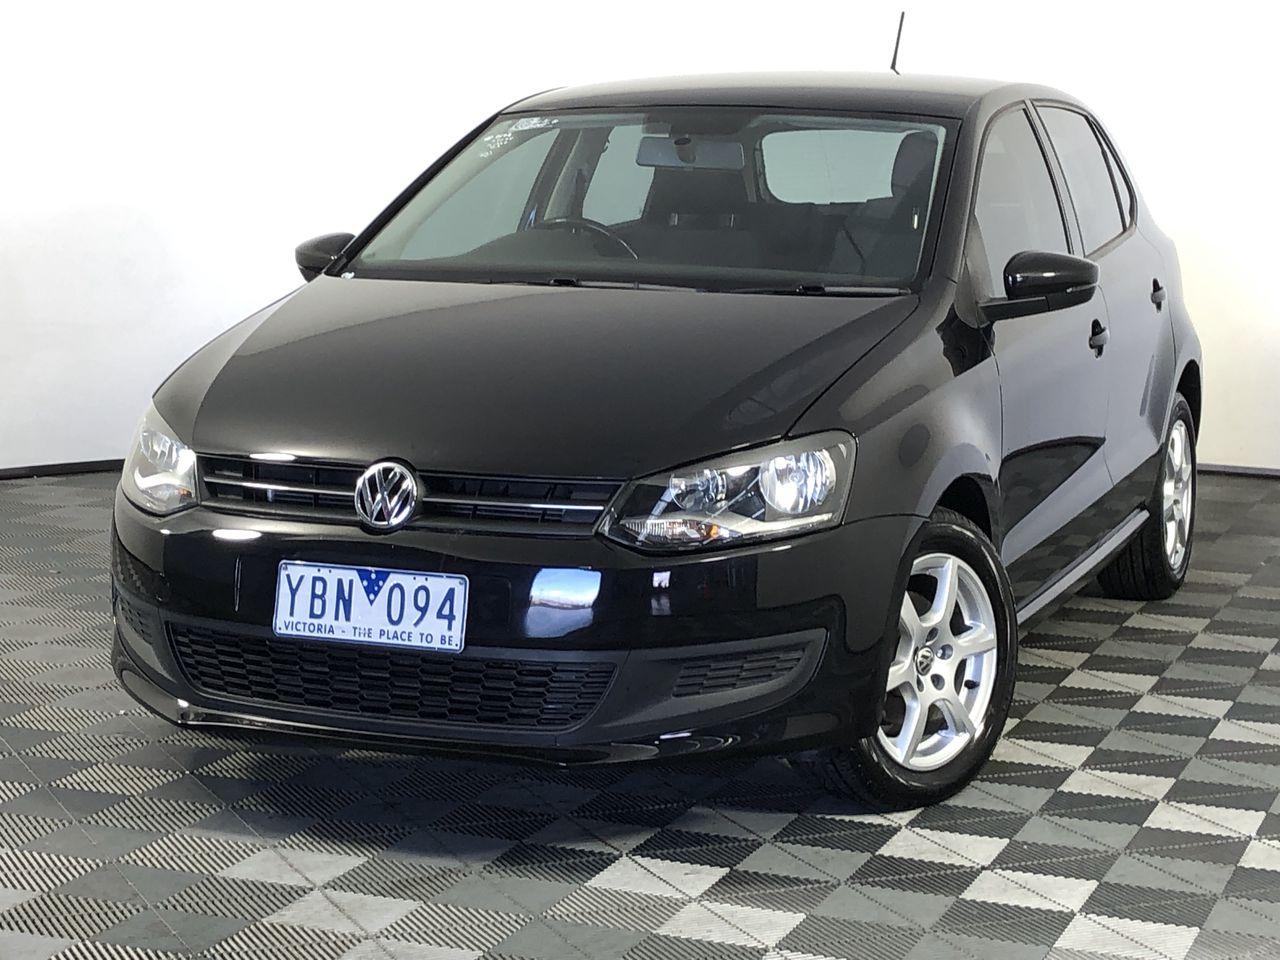 2011 Volkswagen Polo 66 TDI Comfortline 6R Turbo Diesel Automatic Hatchback